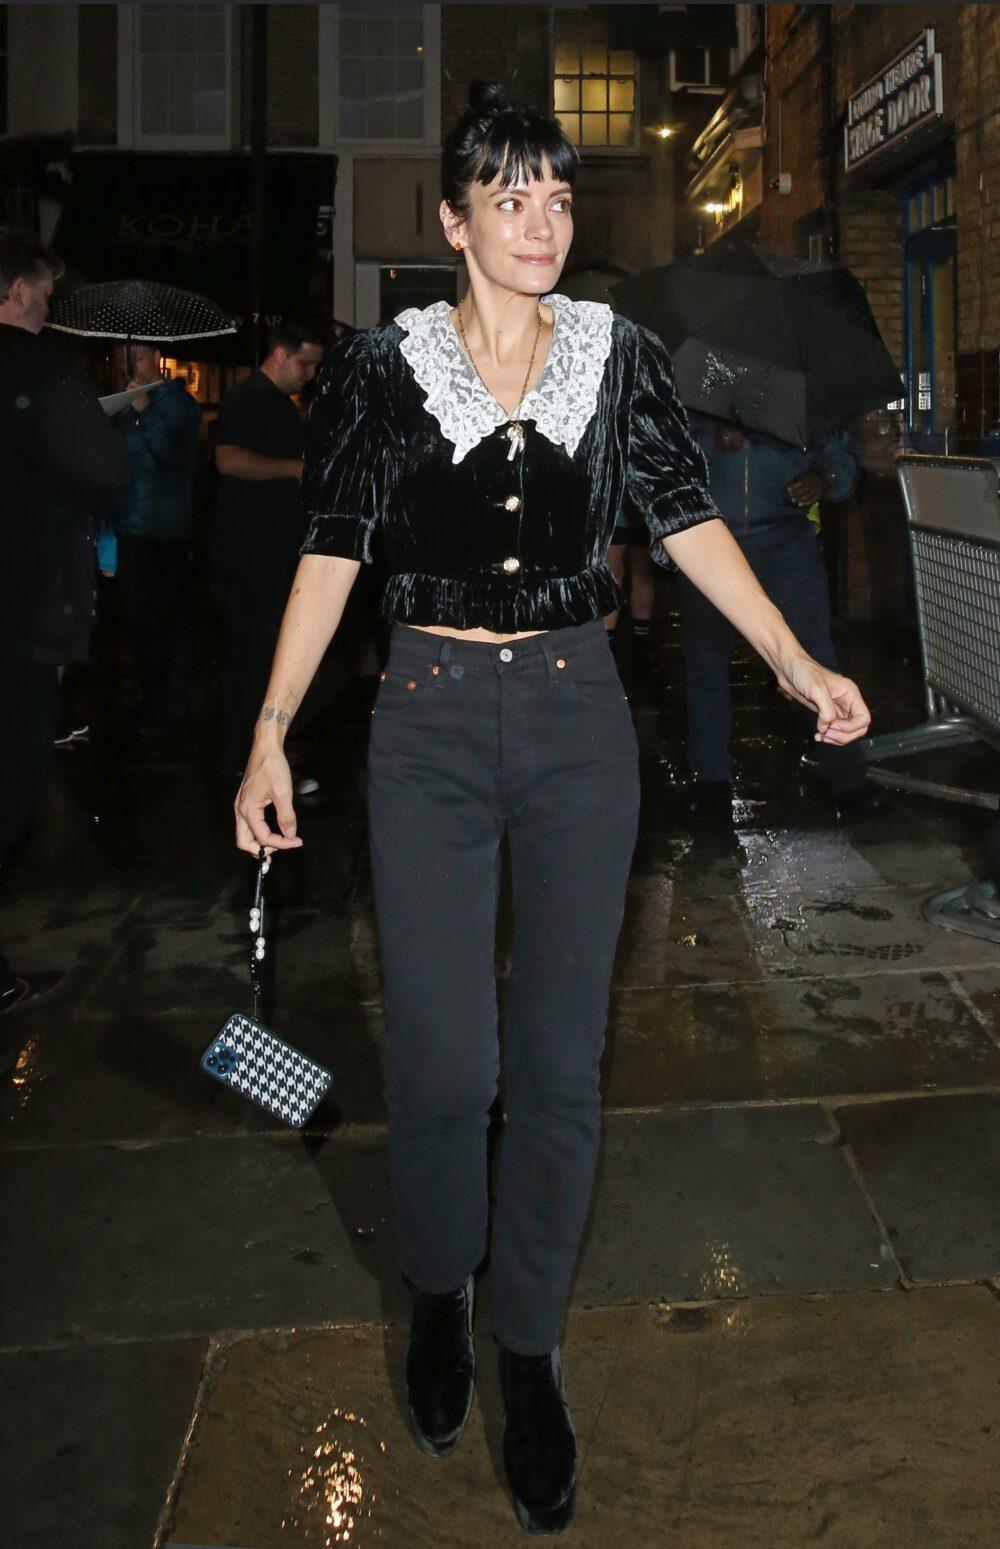 Lily Allen leaving the Noel Coward Theatre